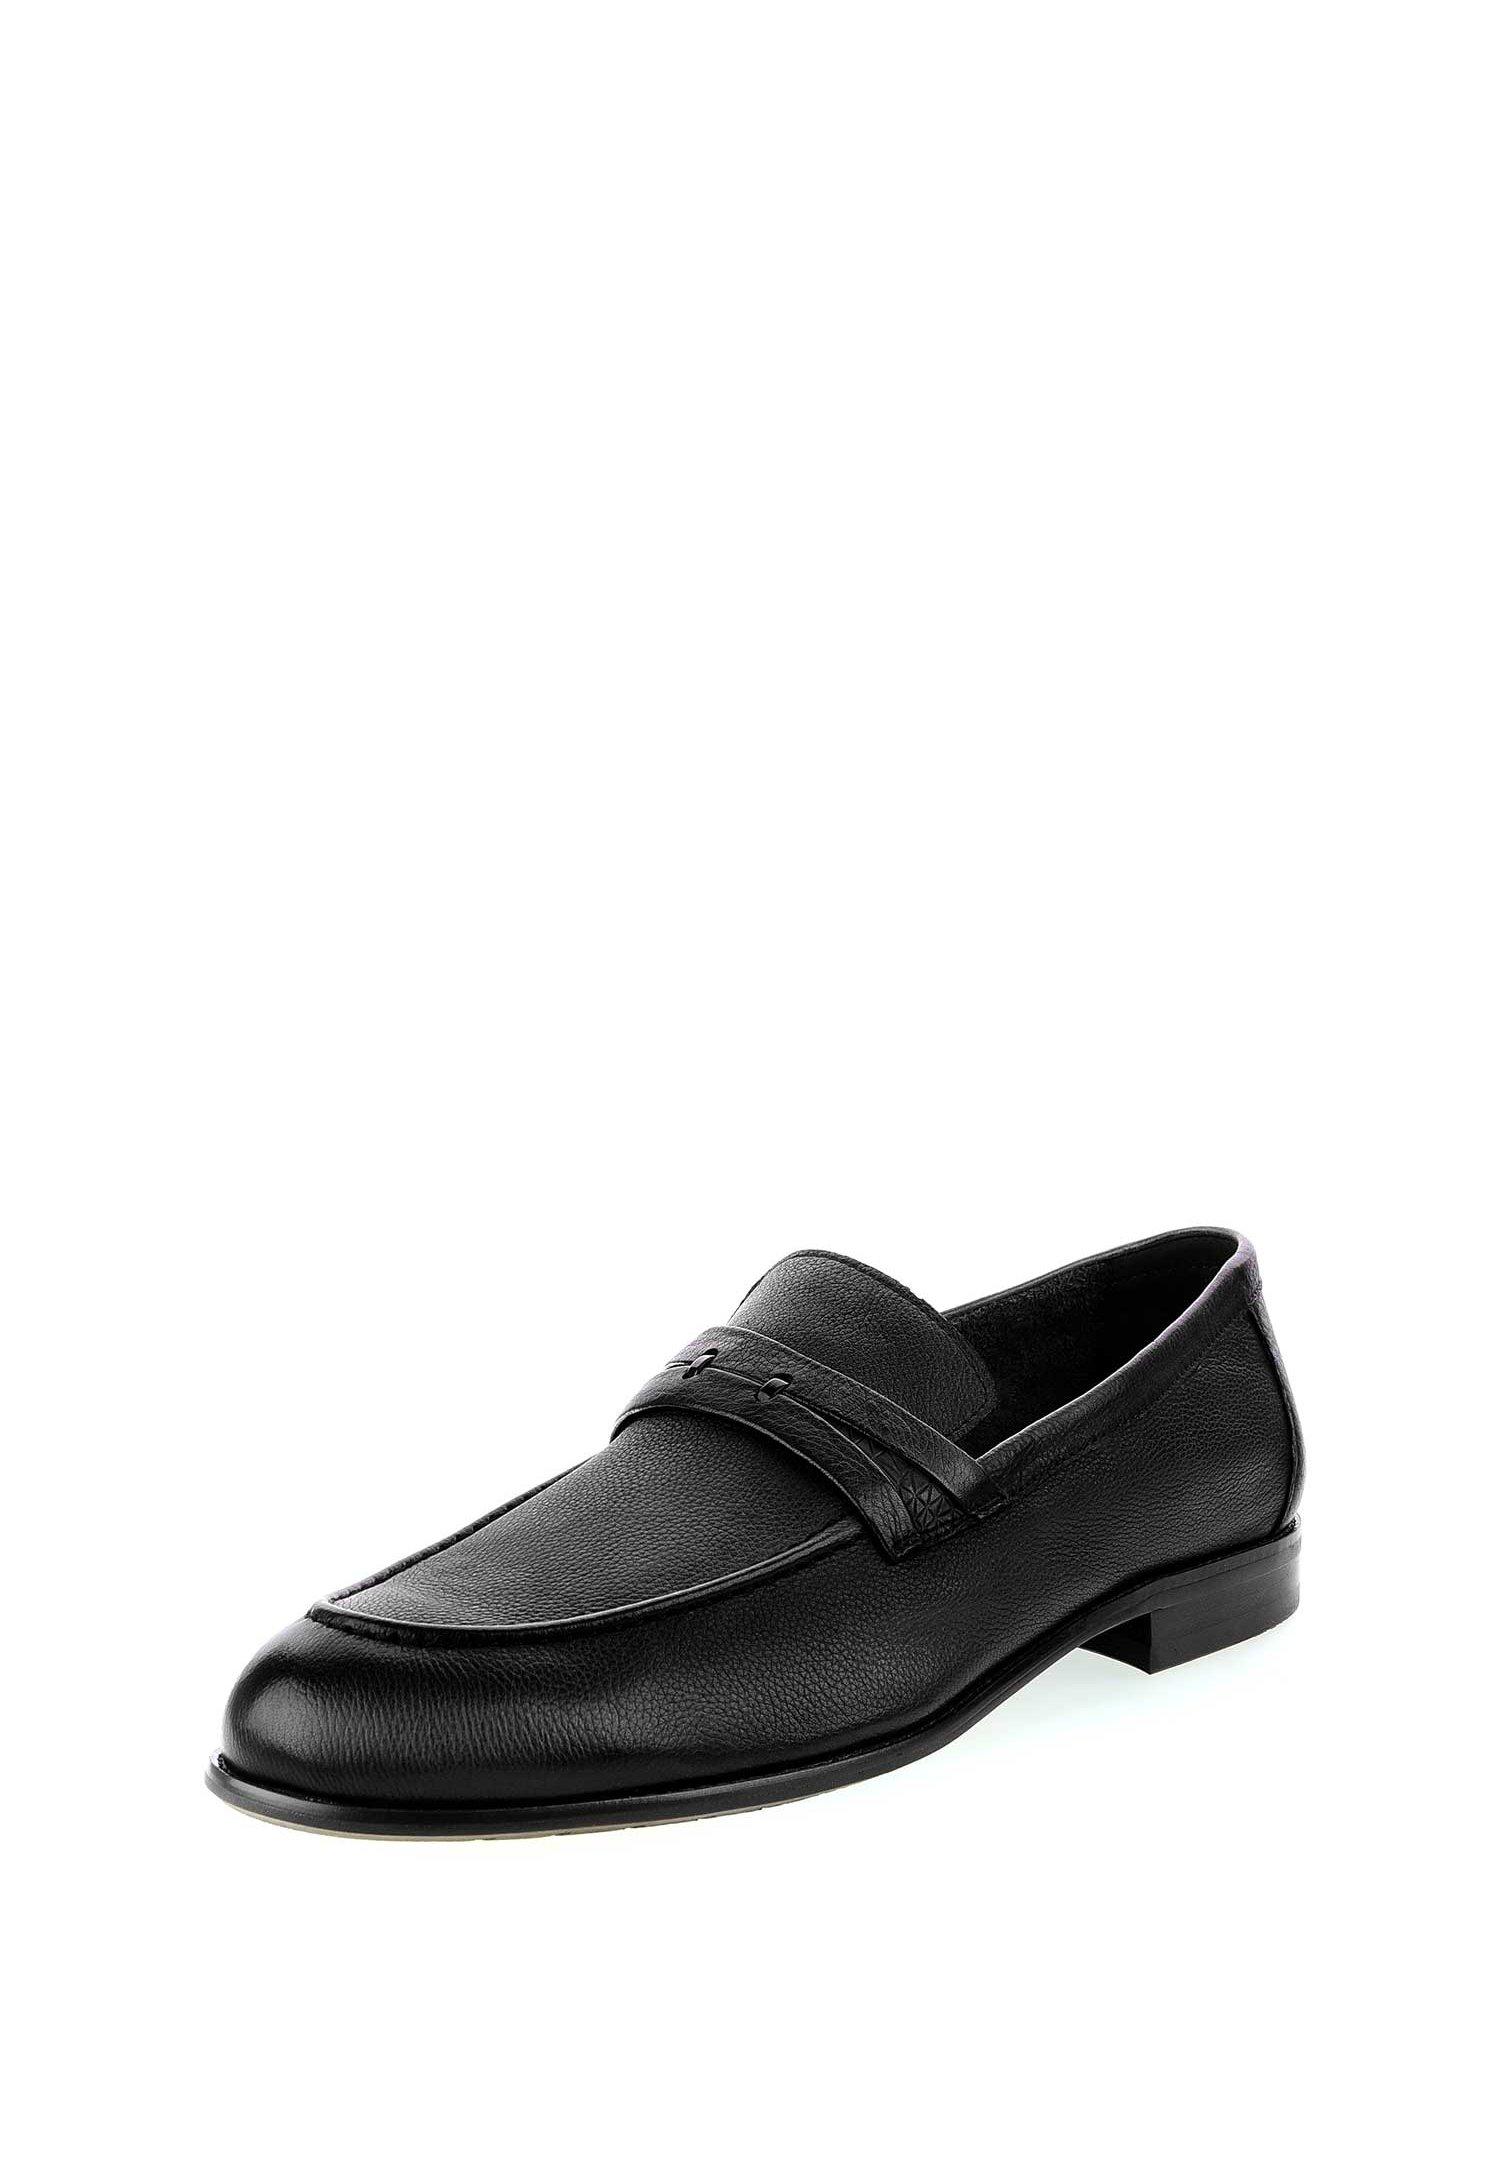 2013 Cheapest PRIMA MODA PAOLINI - Slip-ons - black | men's shoes 2020 x1OL7